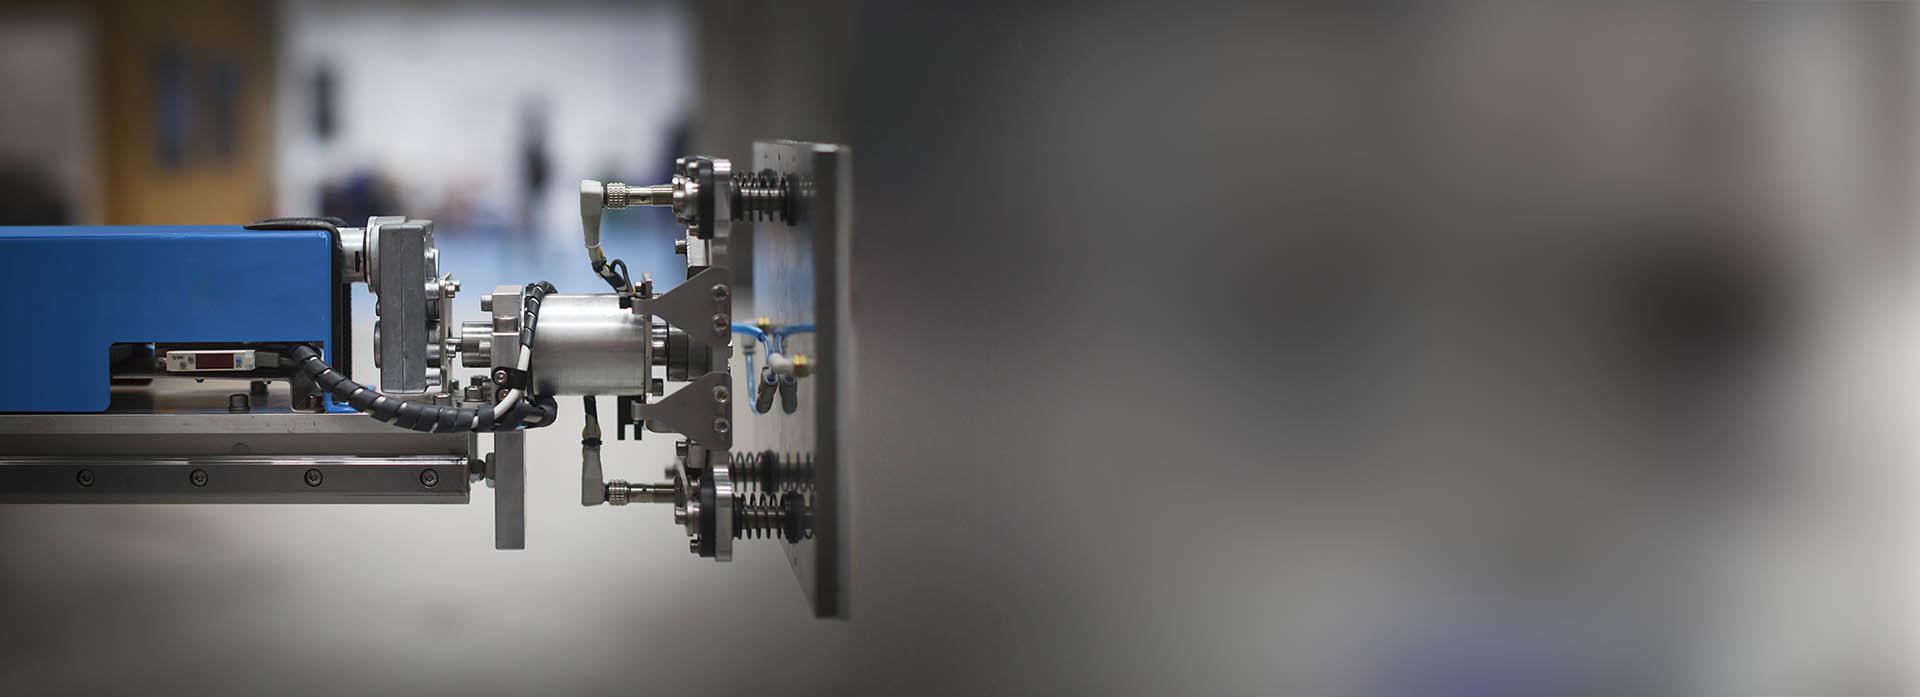 Equipo de etiquetado automático - Detalle de pistón